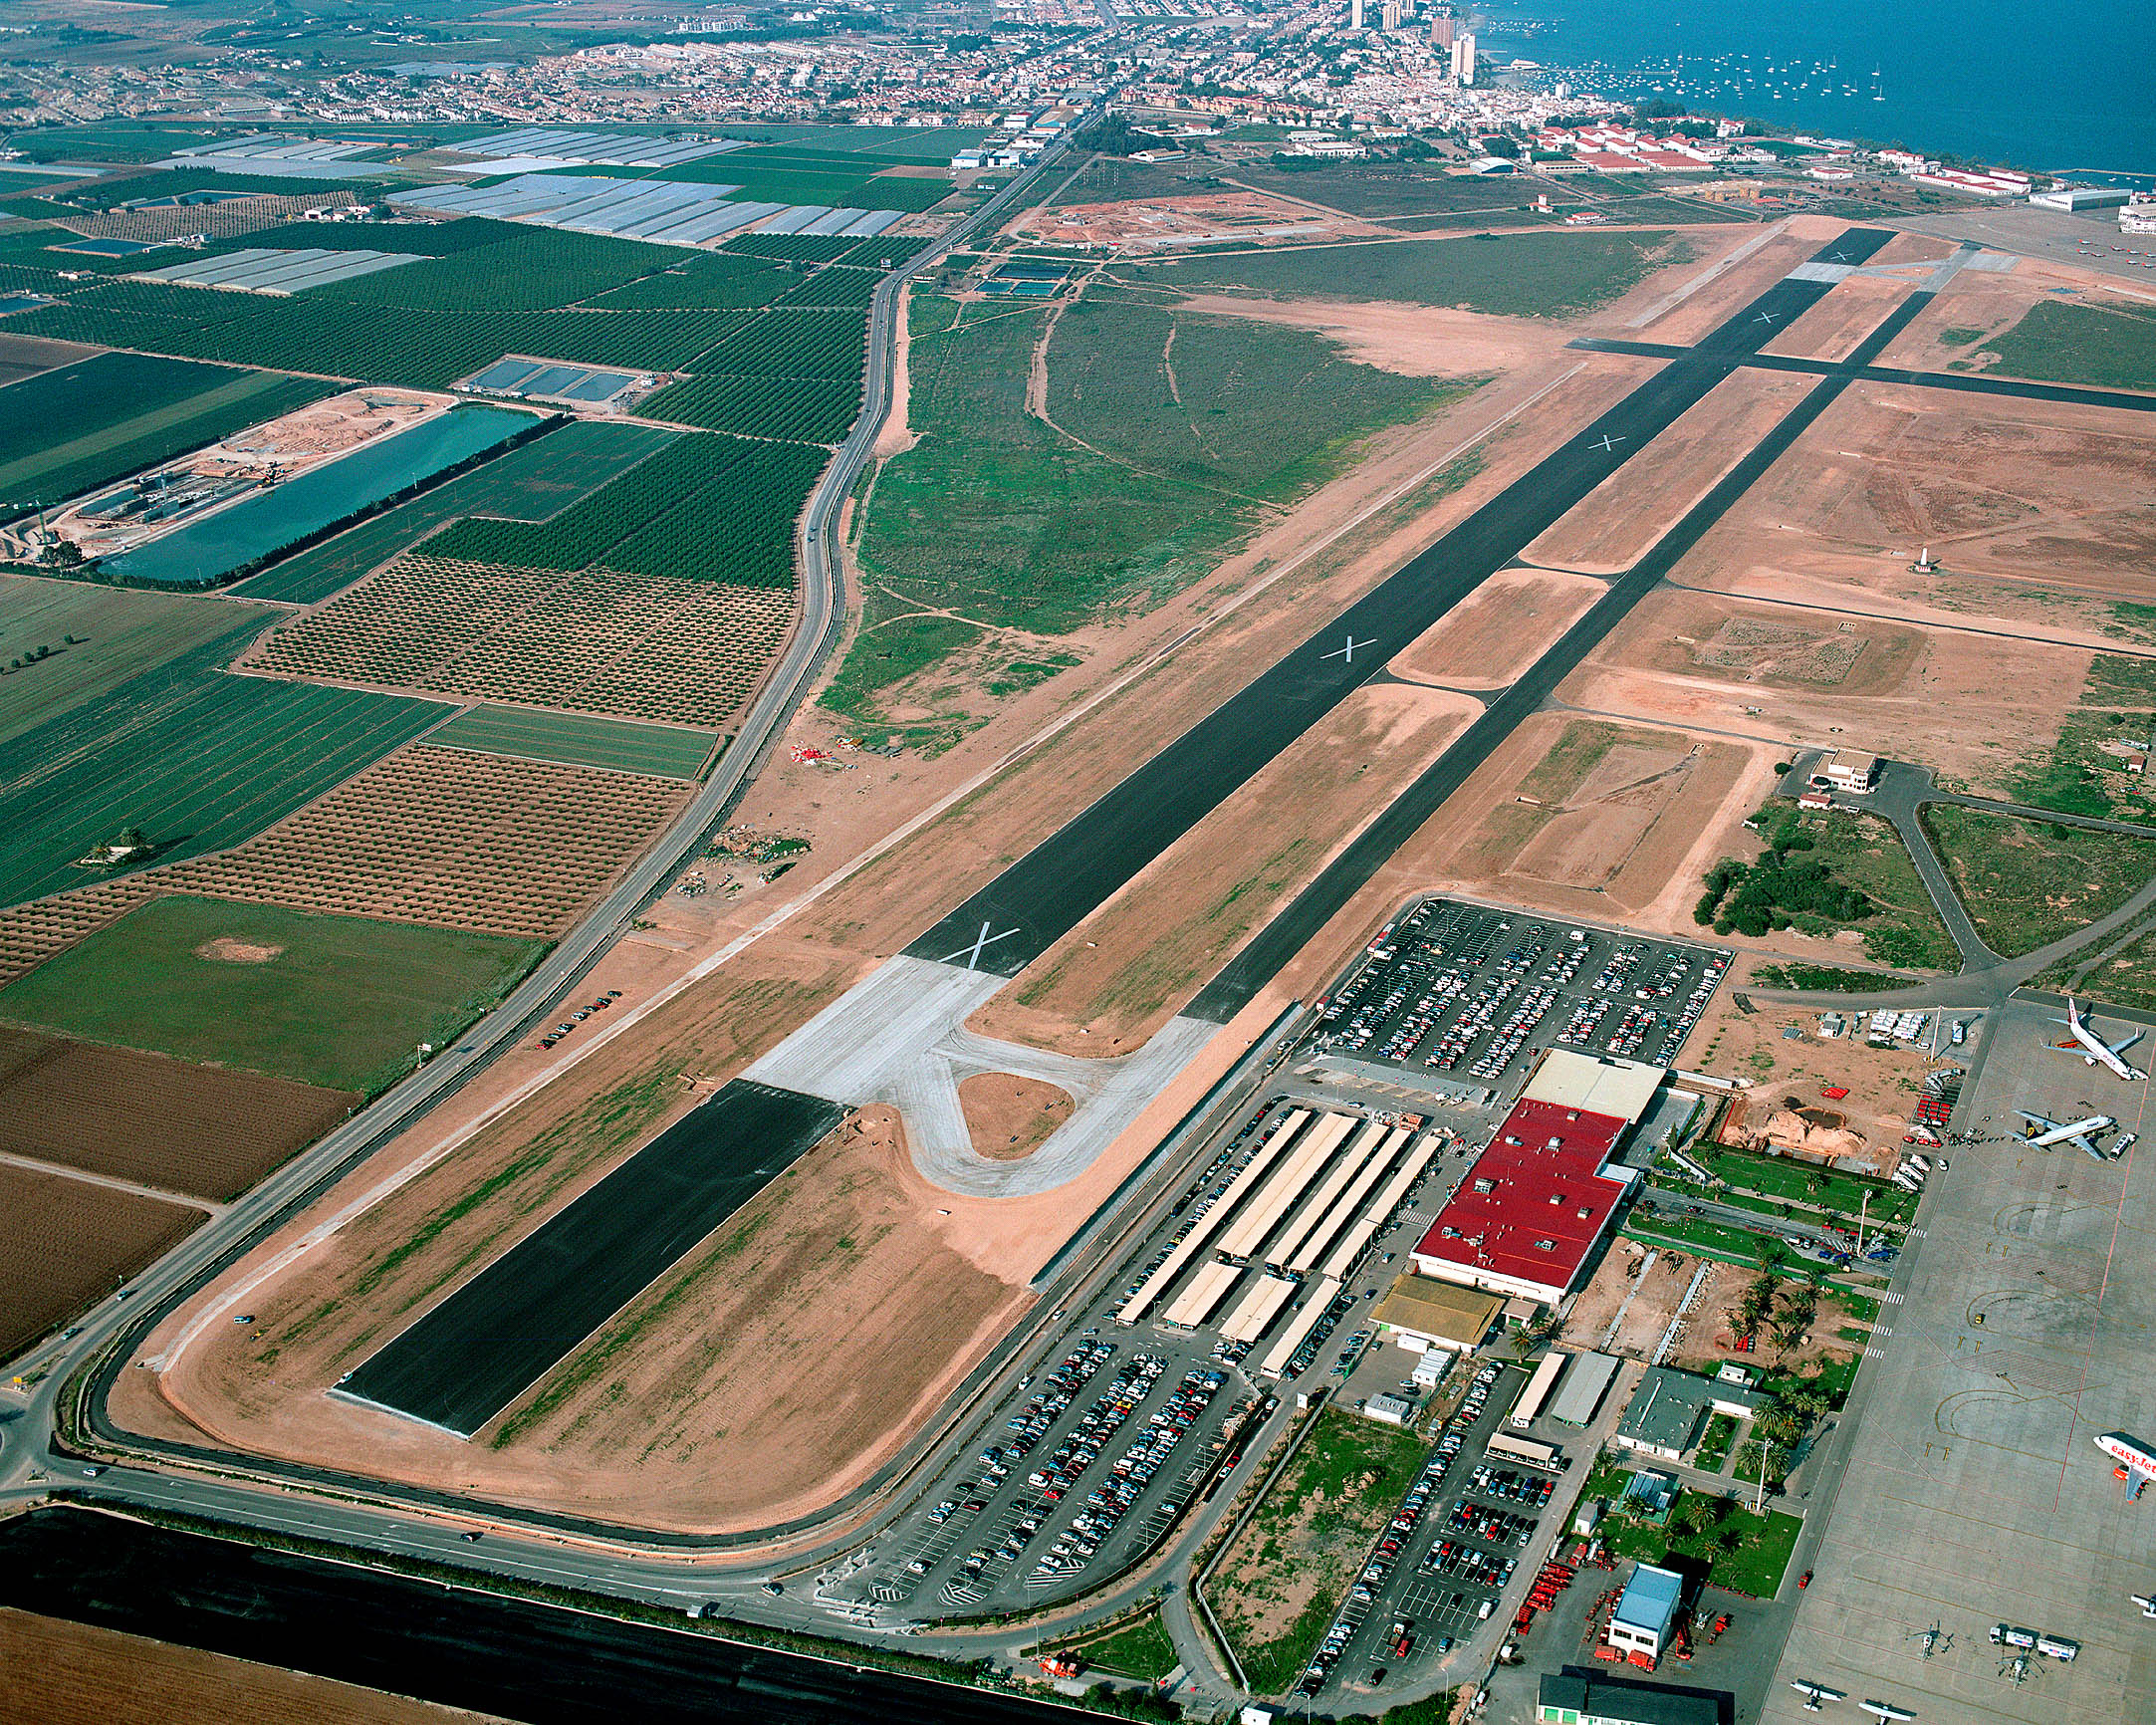 aeropuerto San Javier Murcia